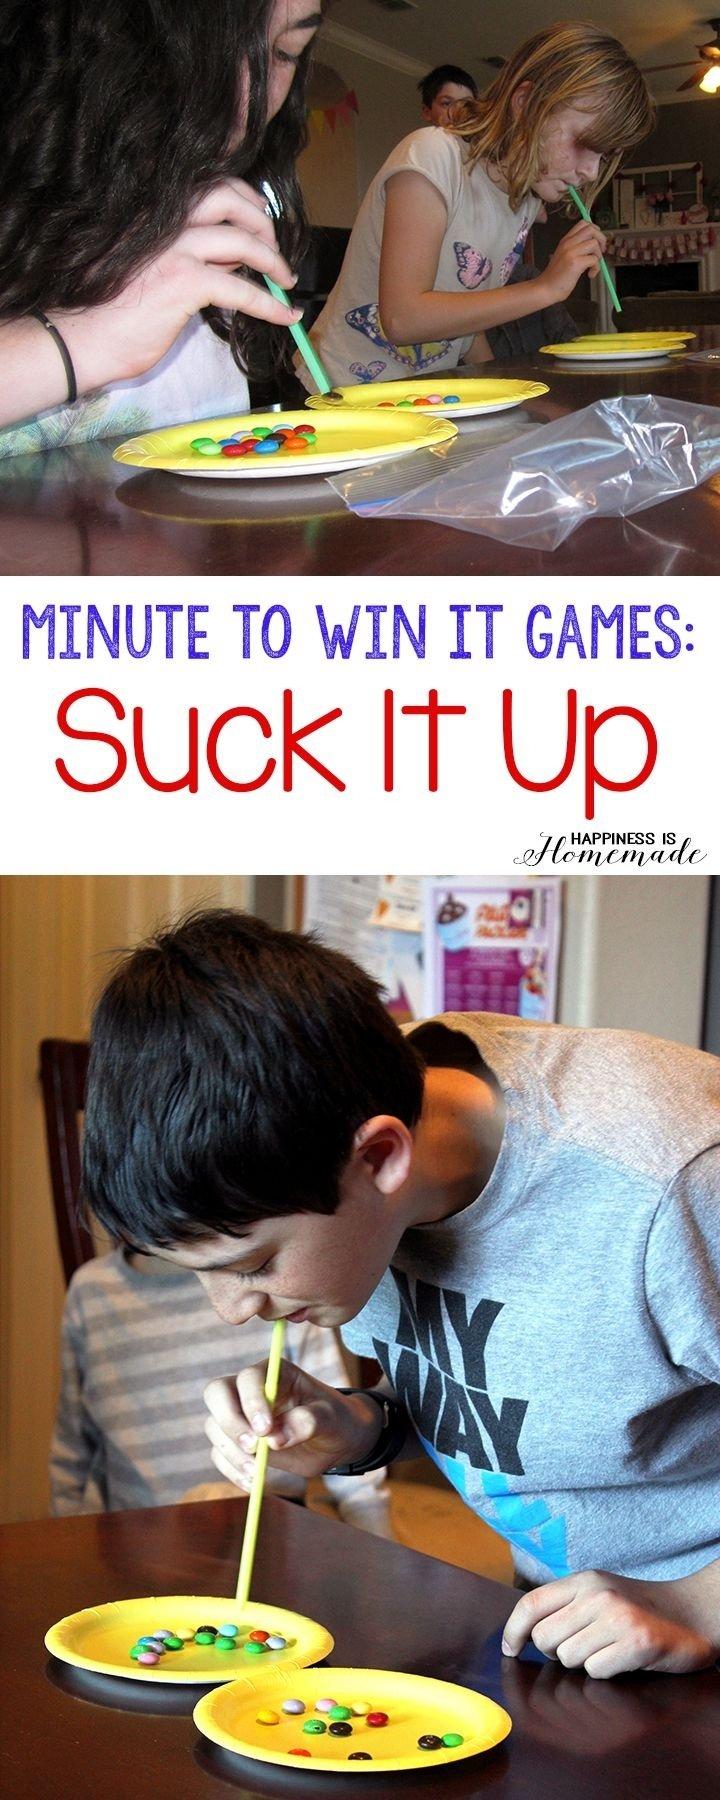 10 Pretty Minute To Win It Ideas For Kids minute to win it games suck it up 10 more fun minute to win it 2020